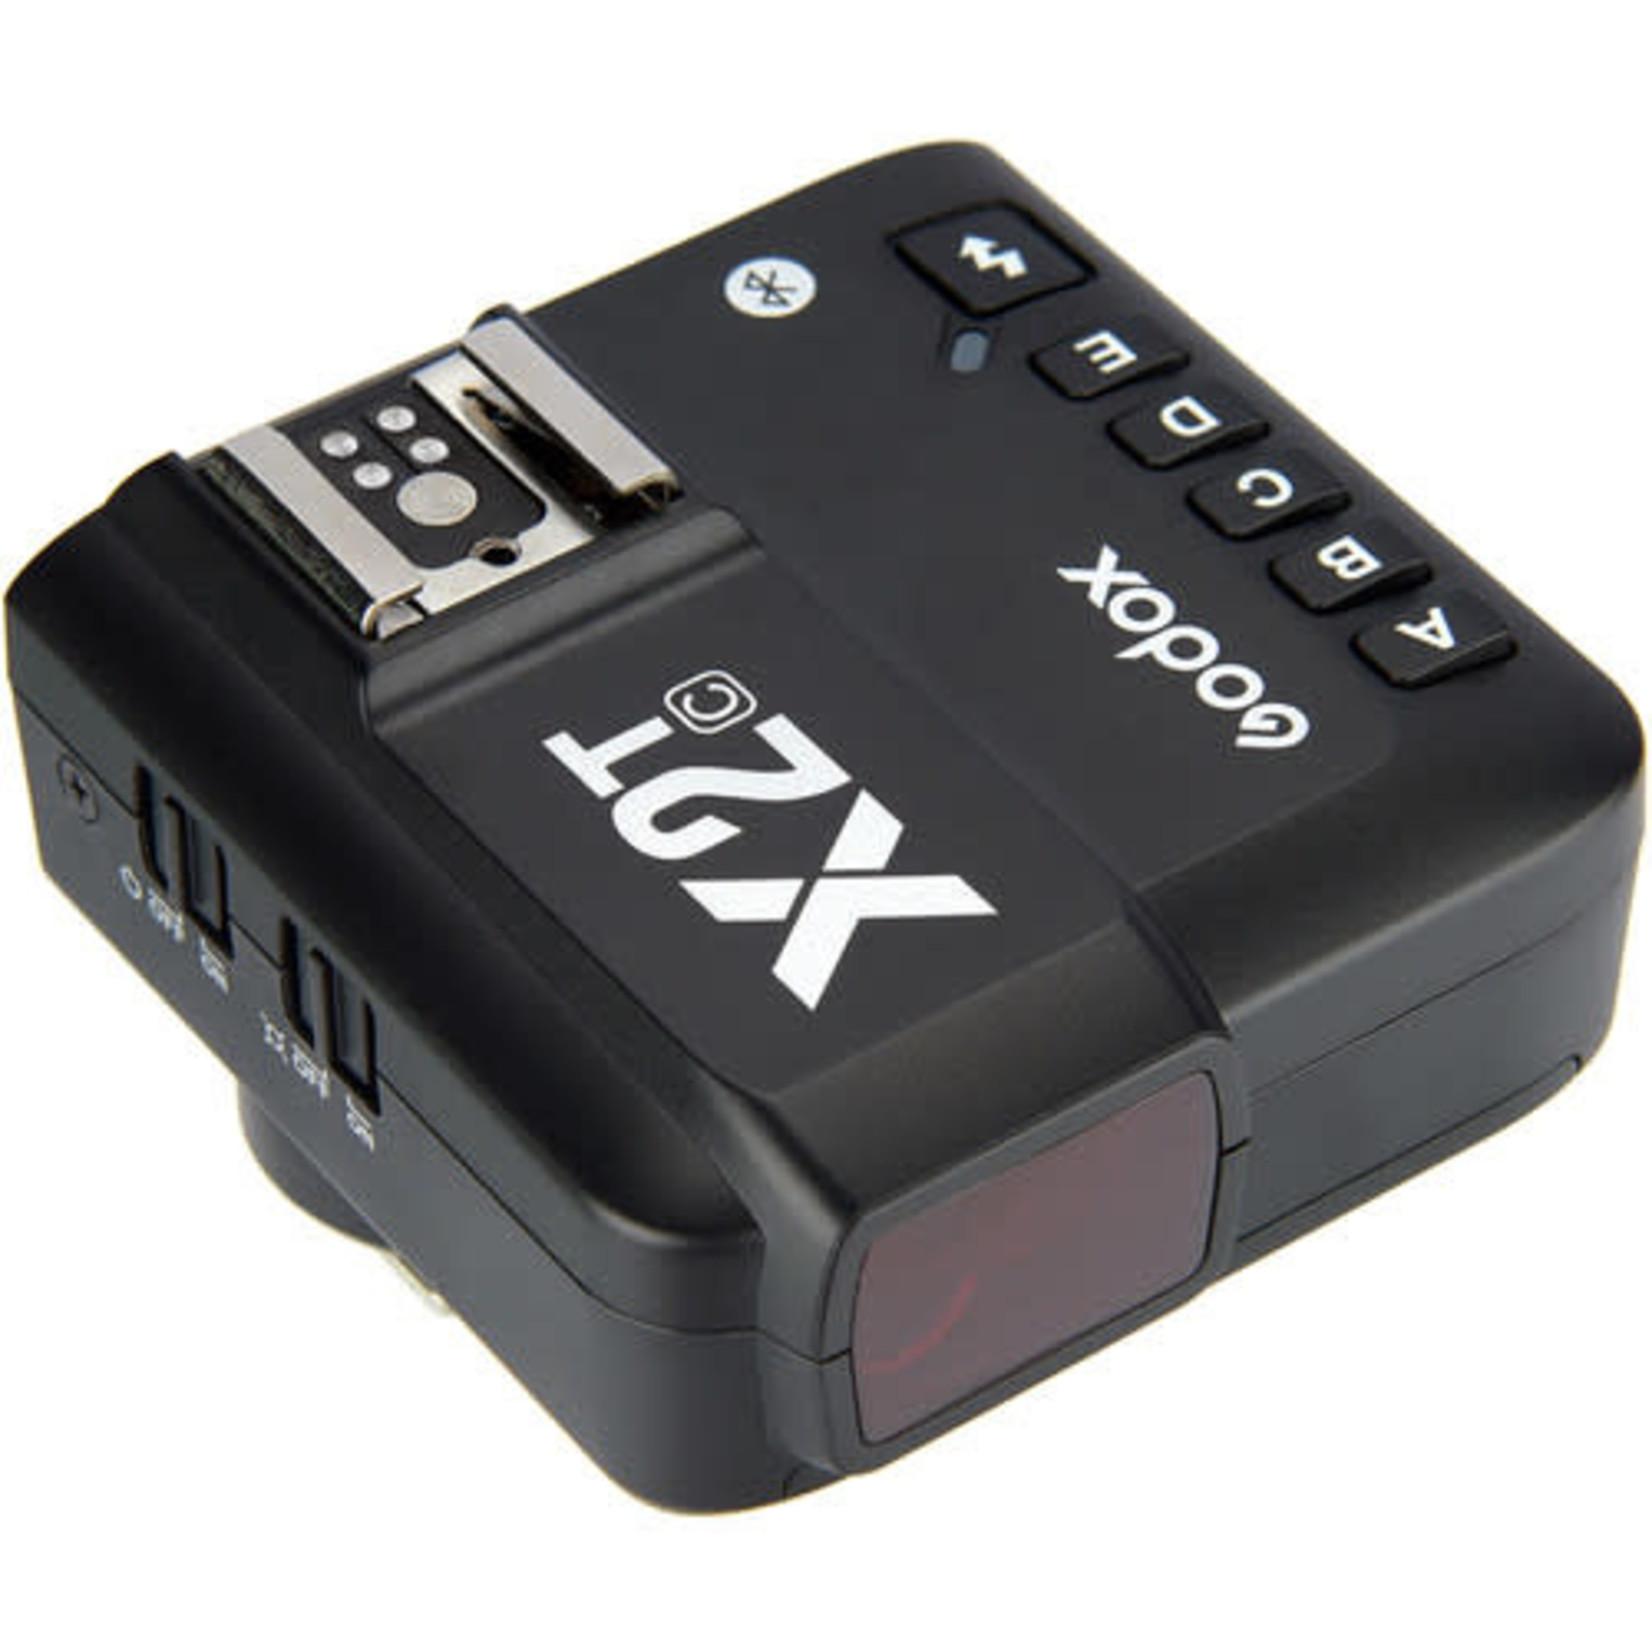 Godox GodoxX2T TTL Wireless Flash Trigger for Canon